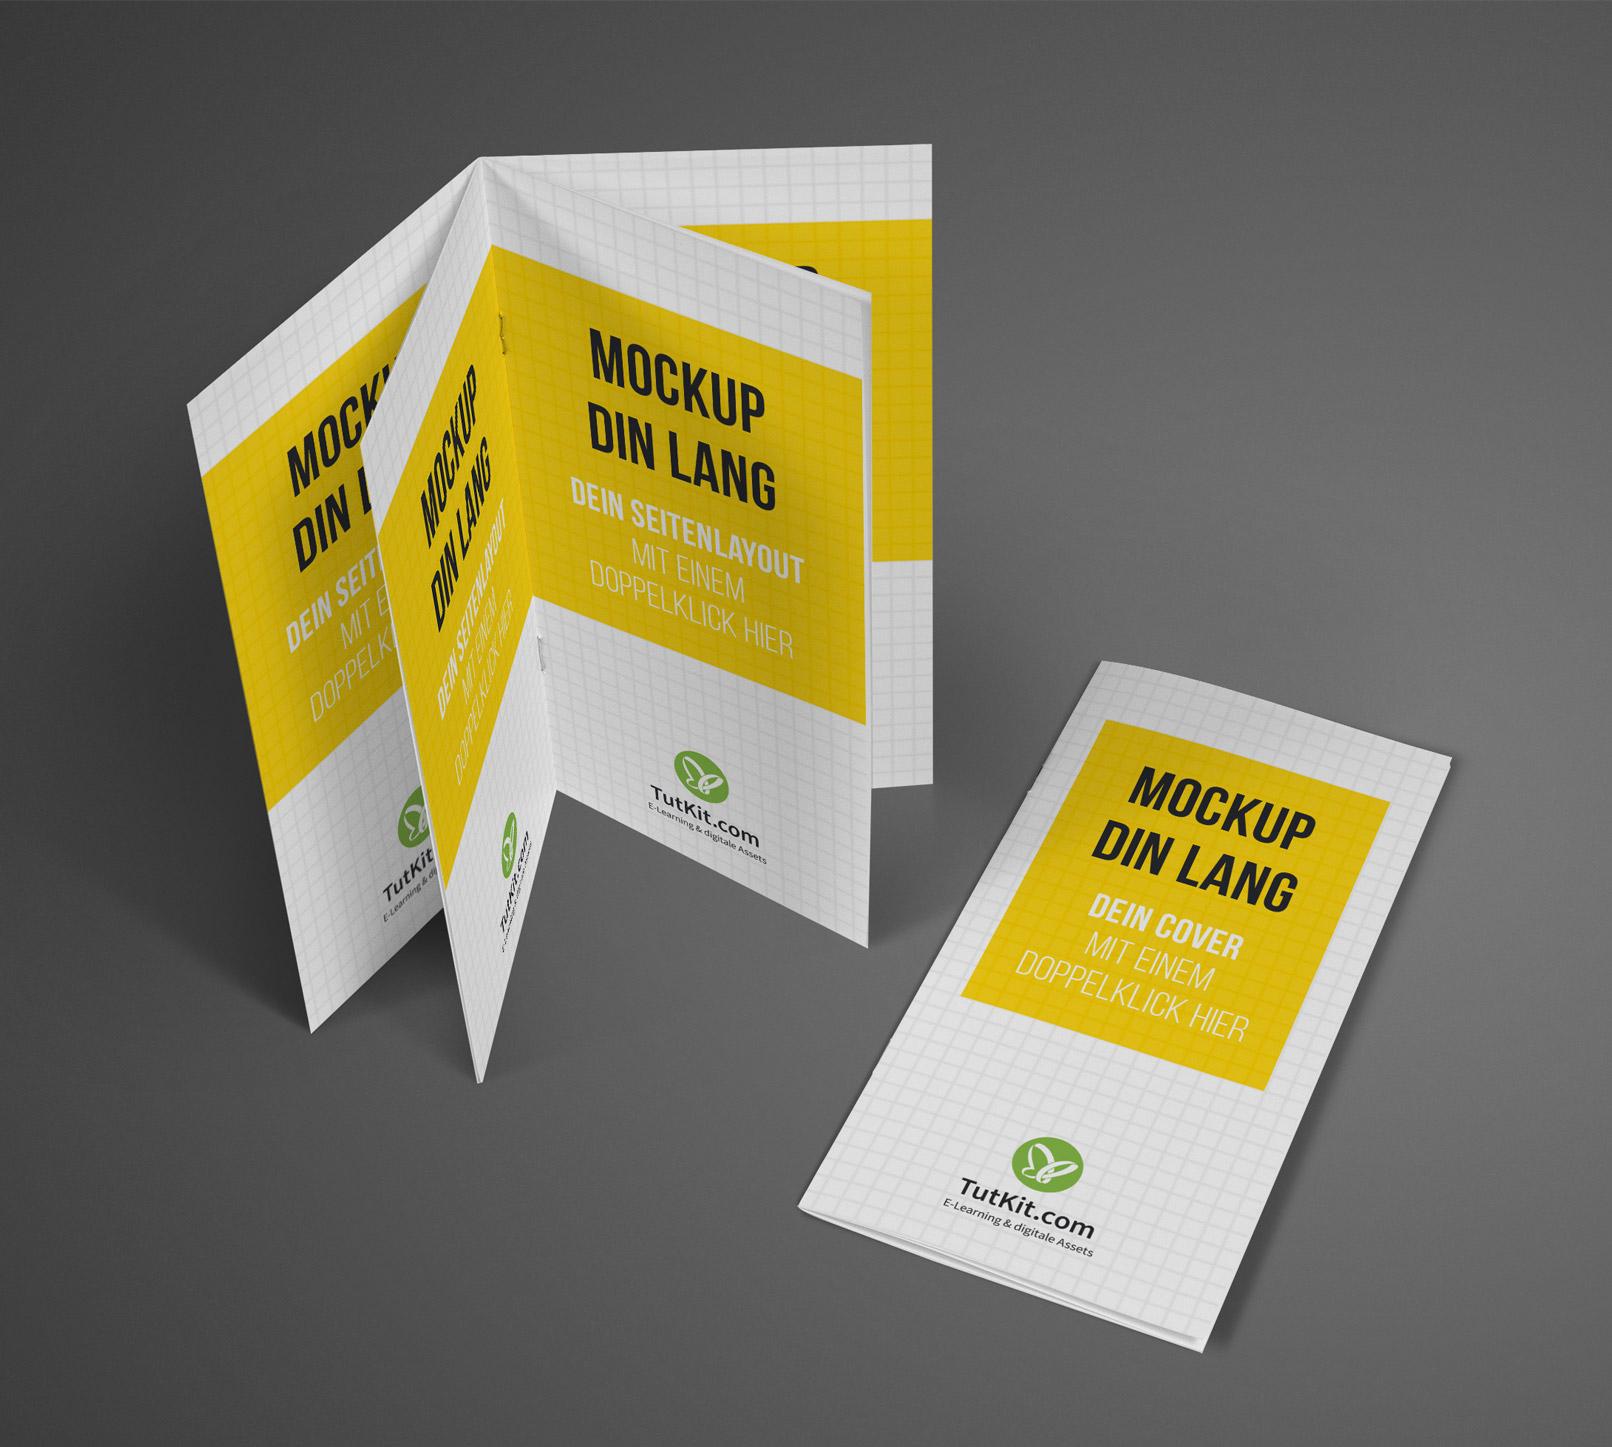 Mockup für Broschüren im DIN-lang-Format